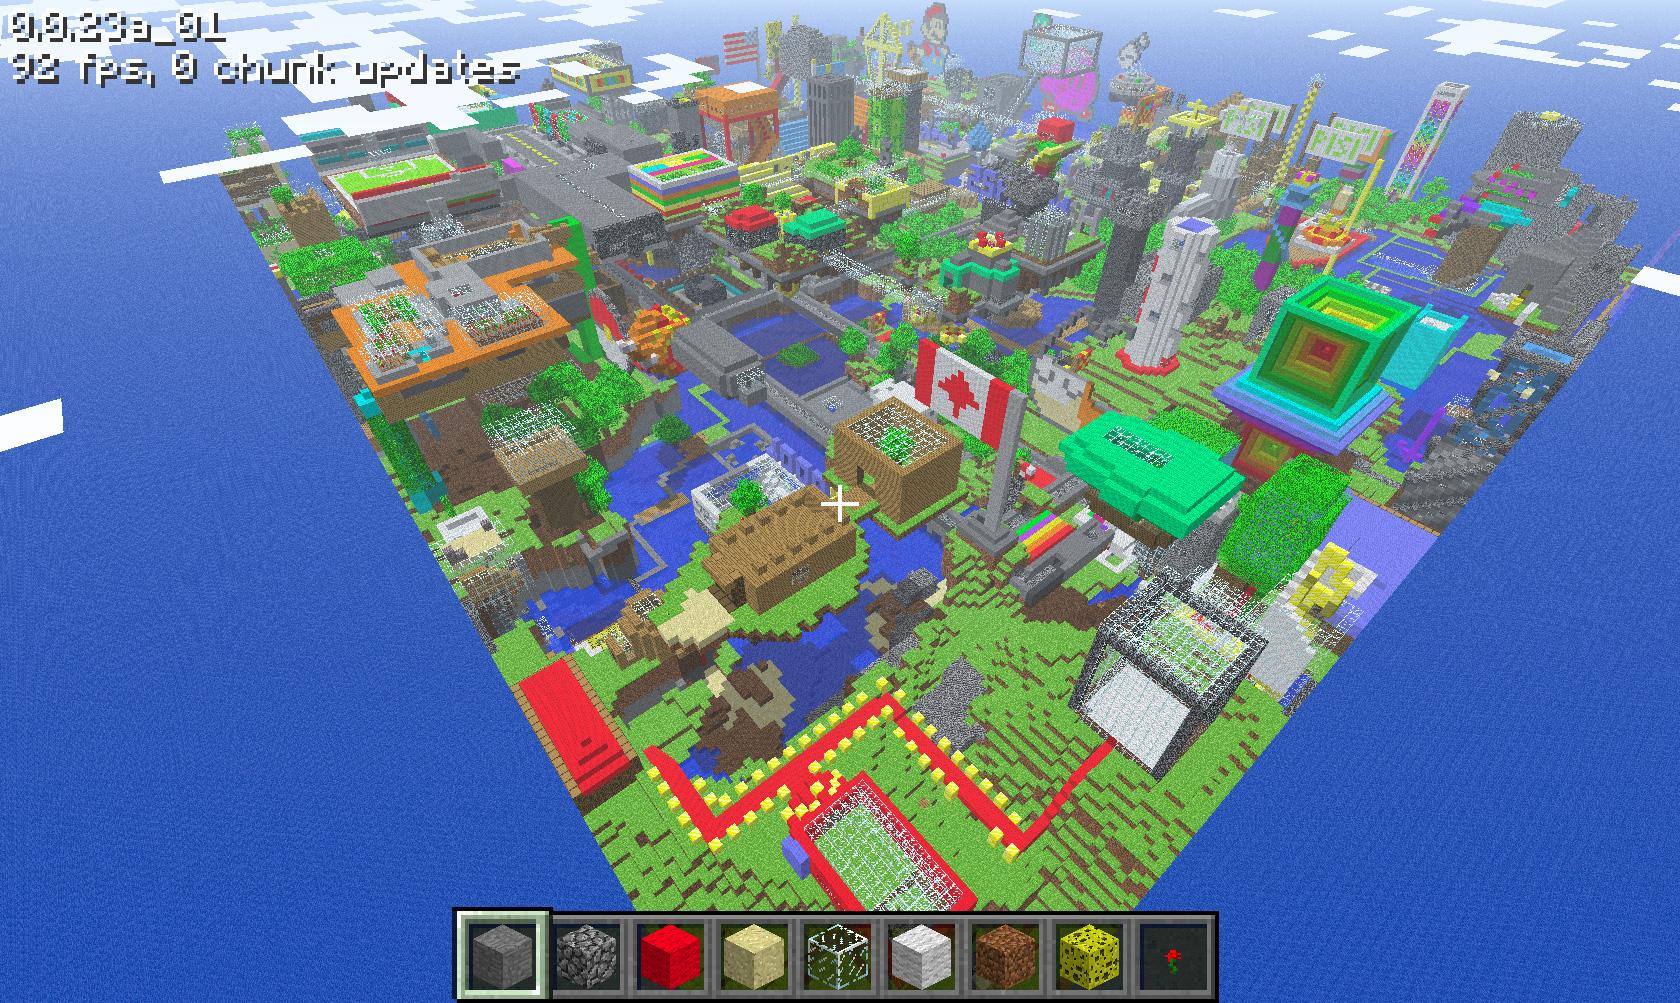 http://troublethinking.files.wordpress.com/2010/09/minecraft.jpg